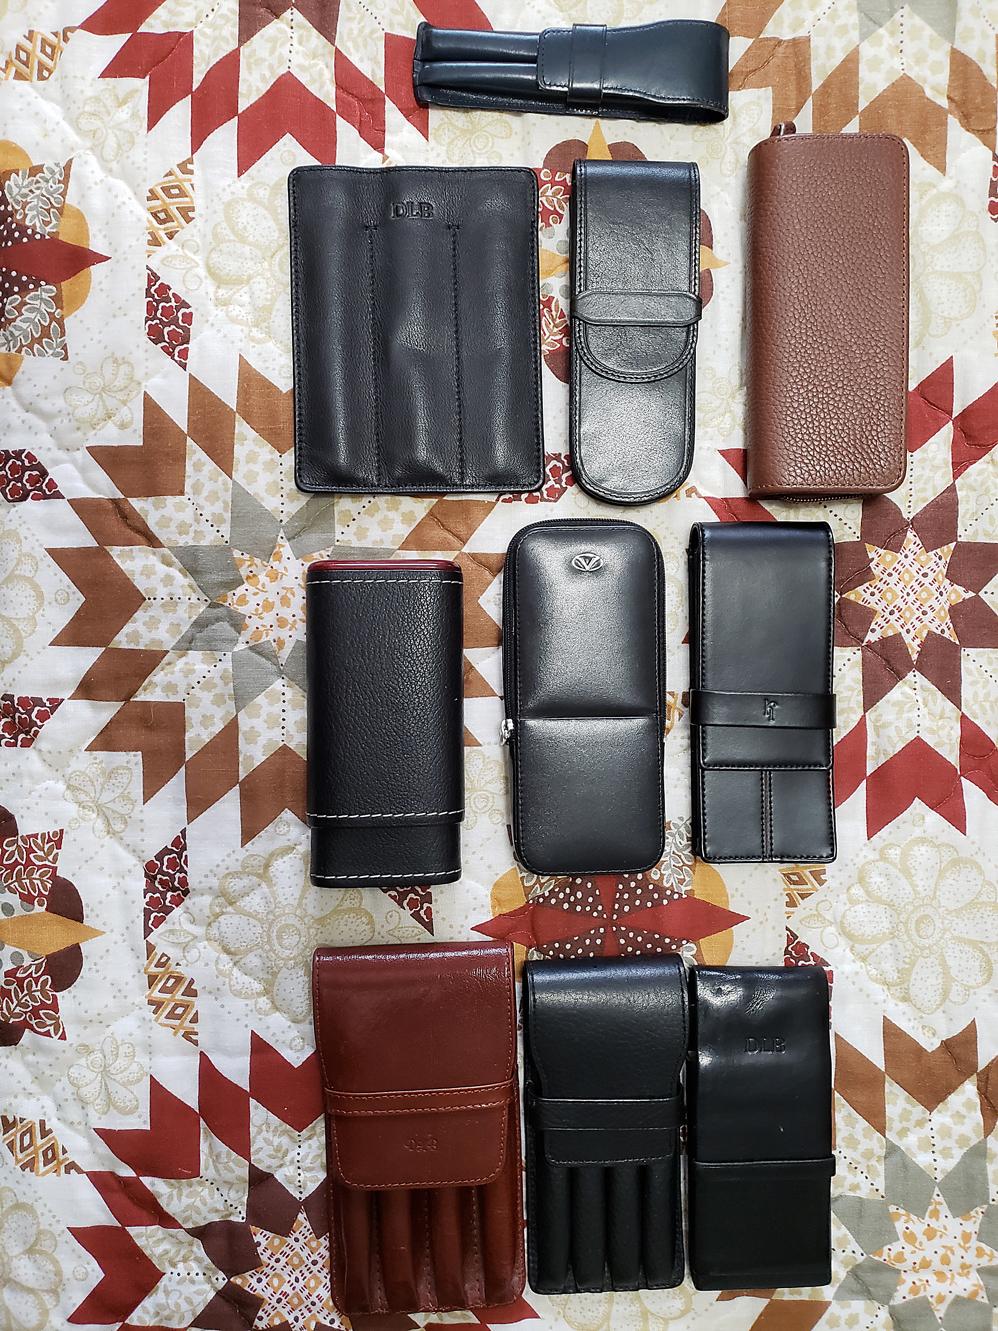 ELONG Chinese traditional Handmade fountain pen case bag for 5 pen black